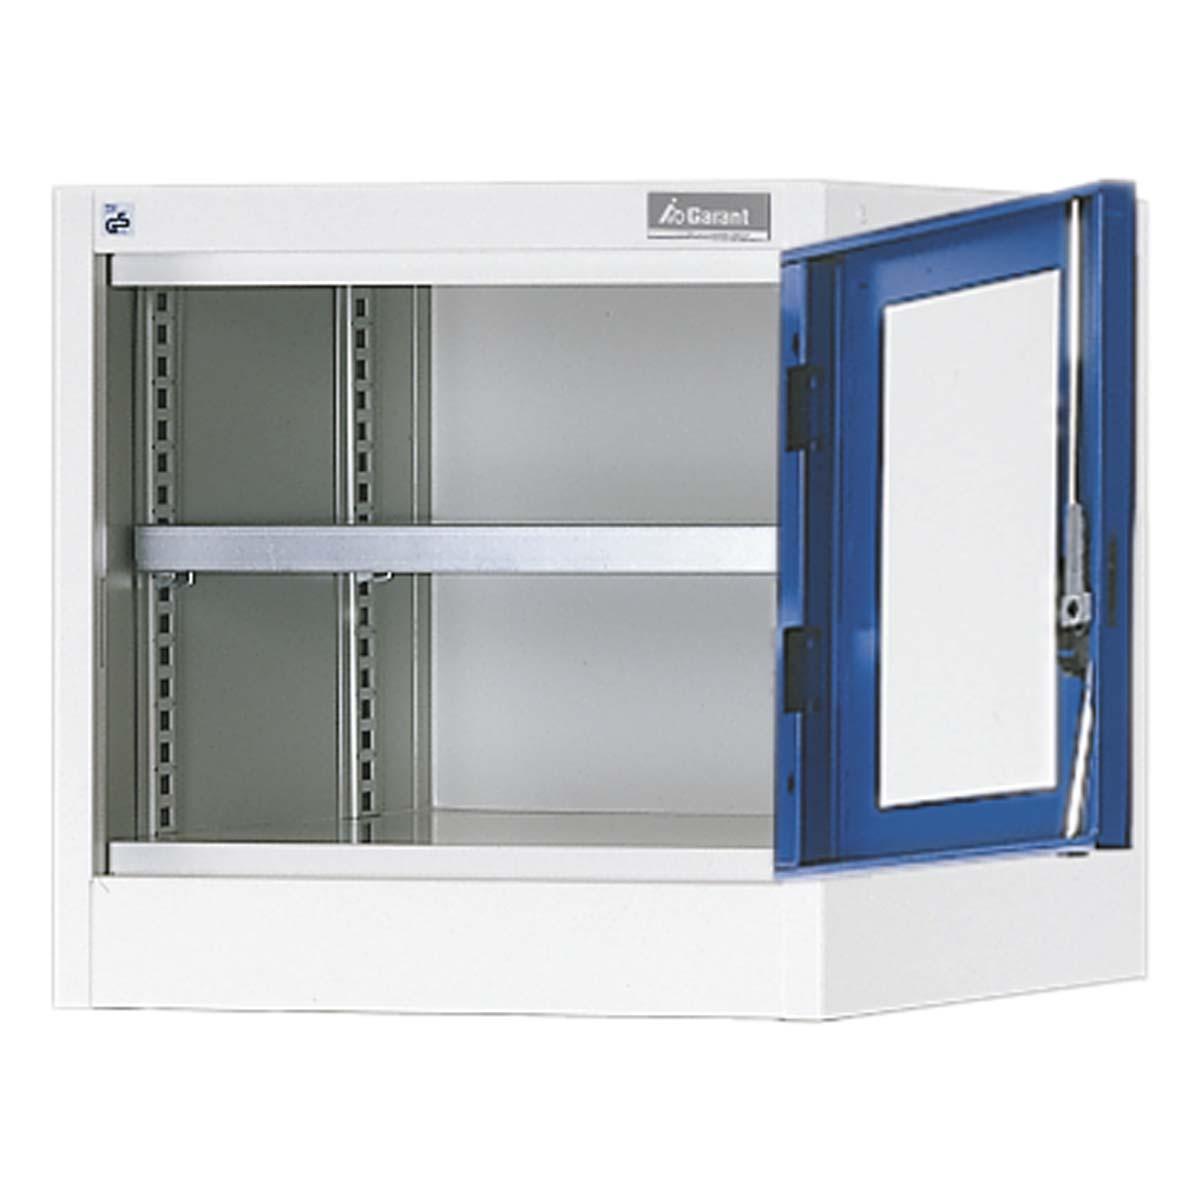 Garant armoire combinable porte battante avec regard - Armoire porte battante ...